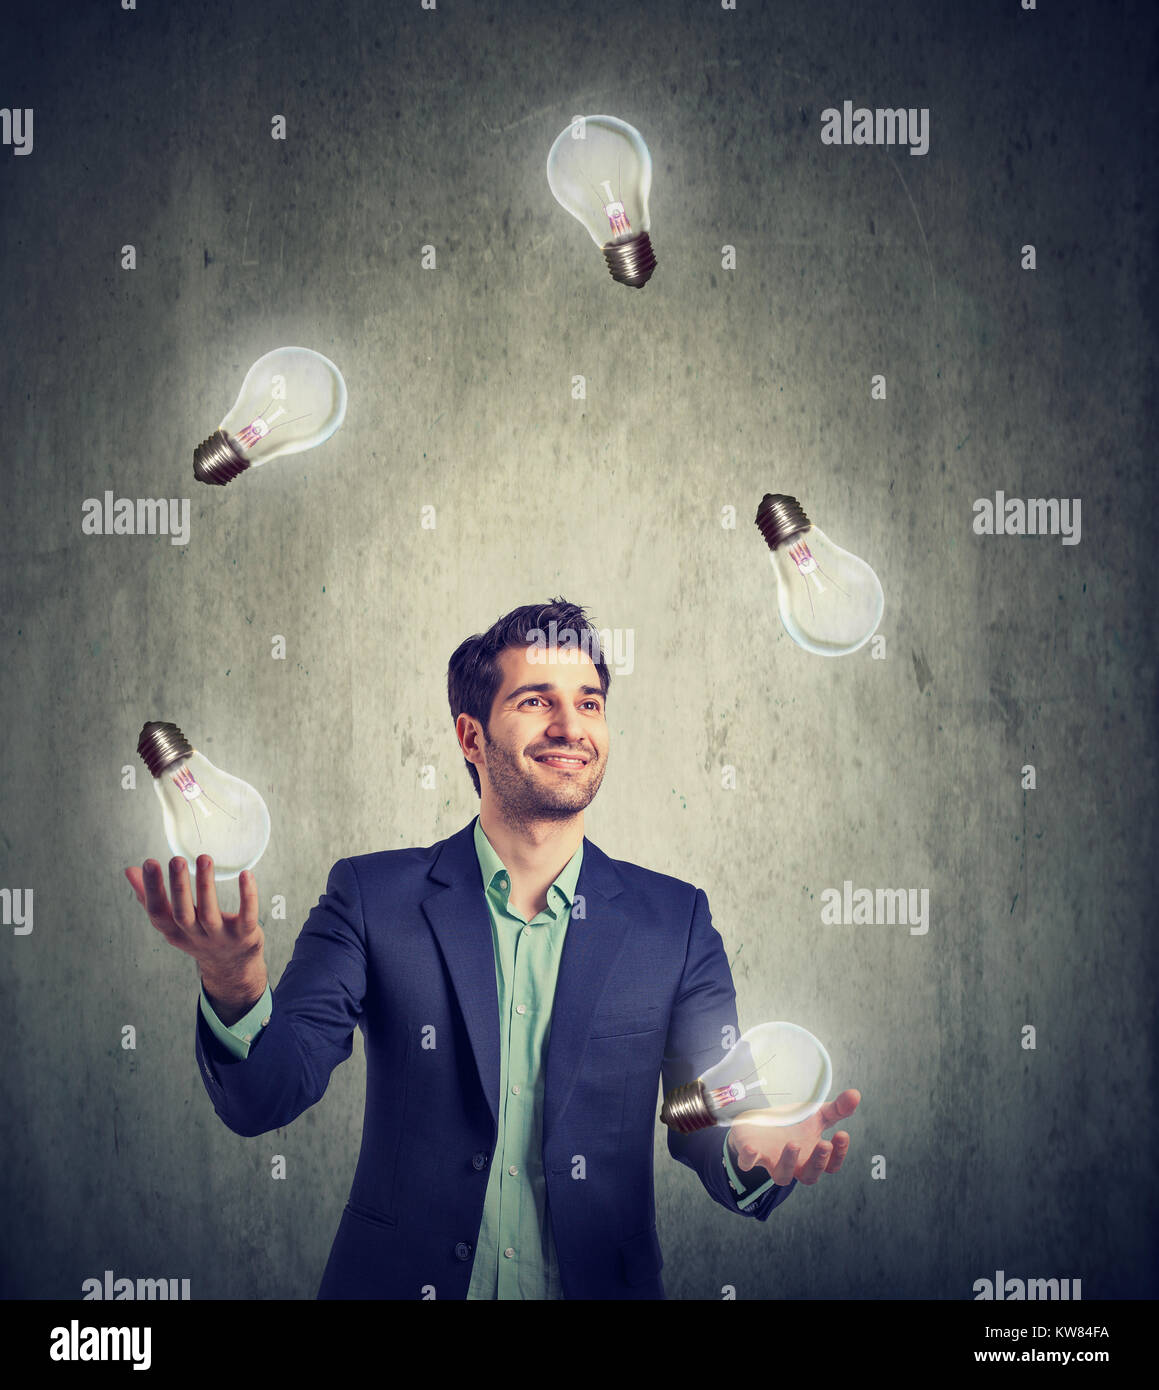 Geschäftsmann jonglieren mit brennenden Lampen in vielen tollen Ideen. Stockbild